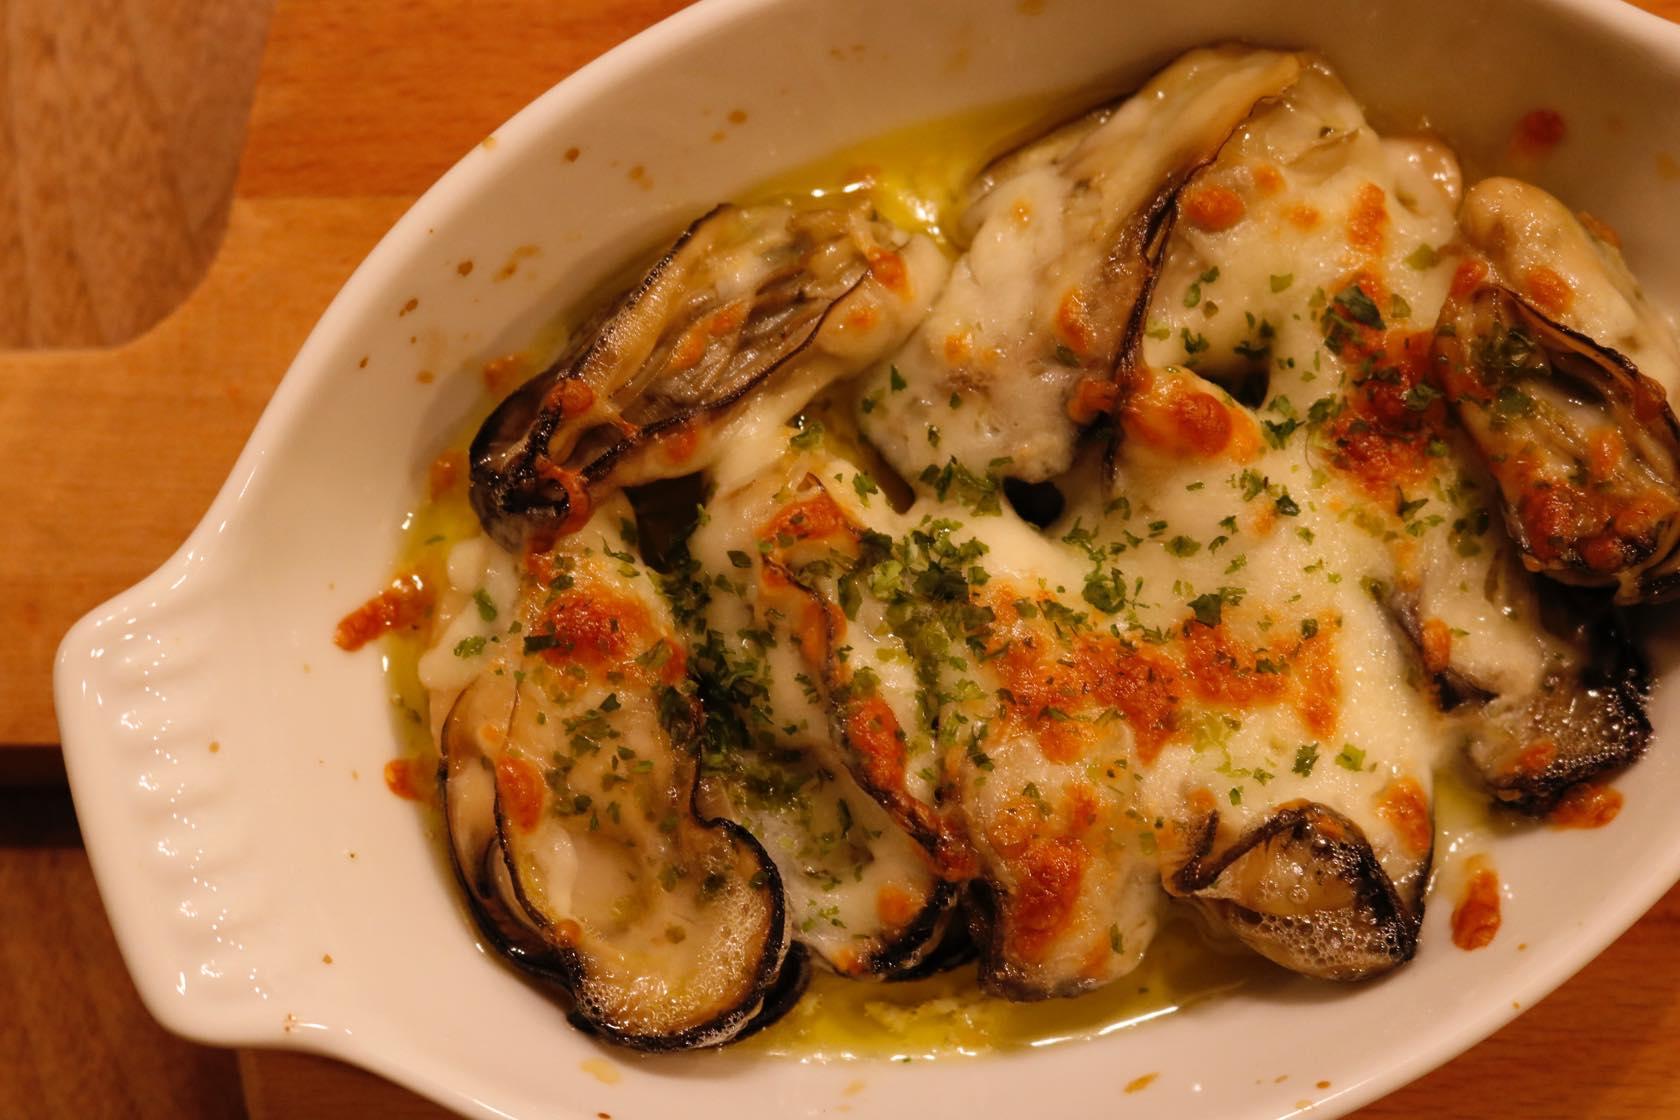 ONDtable 岡山県、寄島カキ直売所「應本水産」の牡蠣 | ONDweb